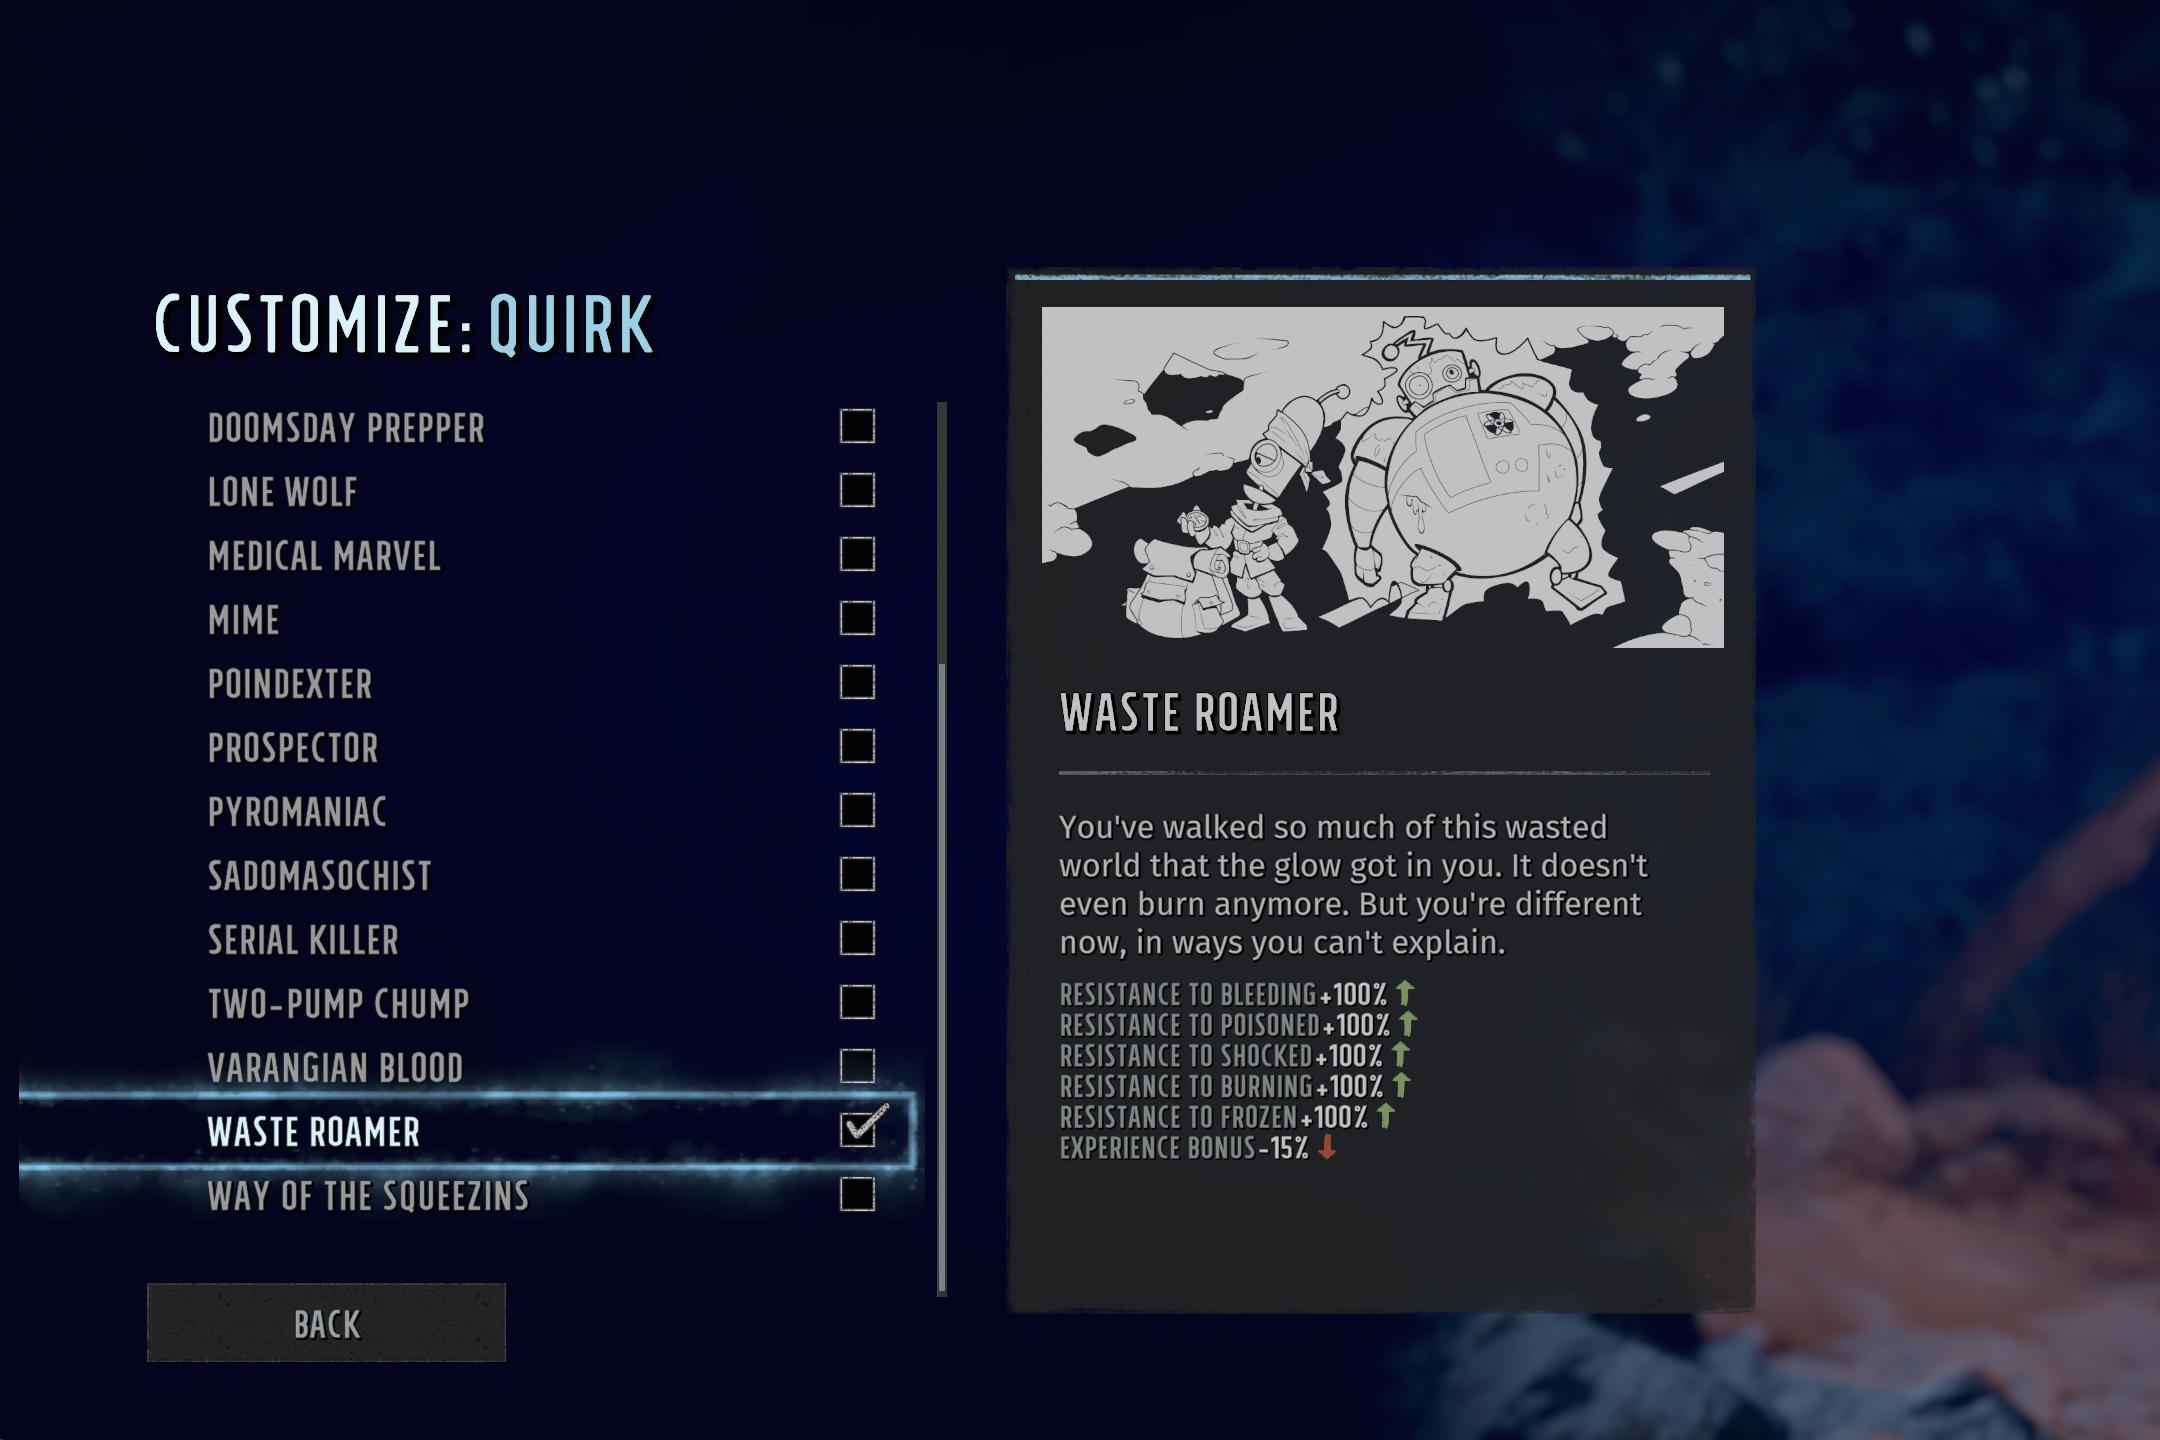 Wasteland 3 character customization screen